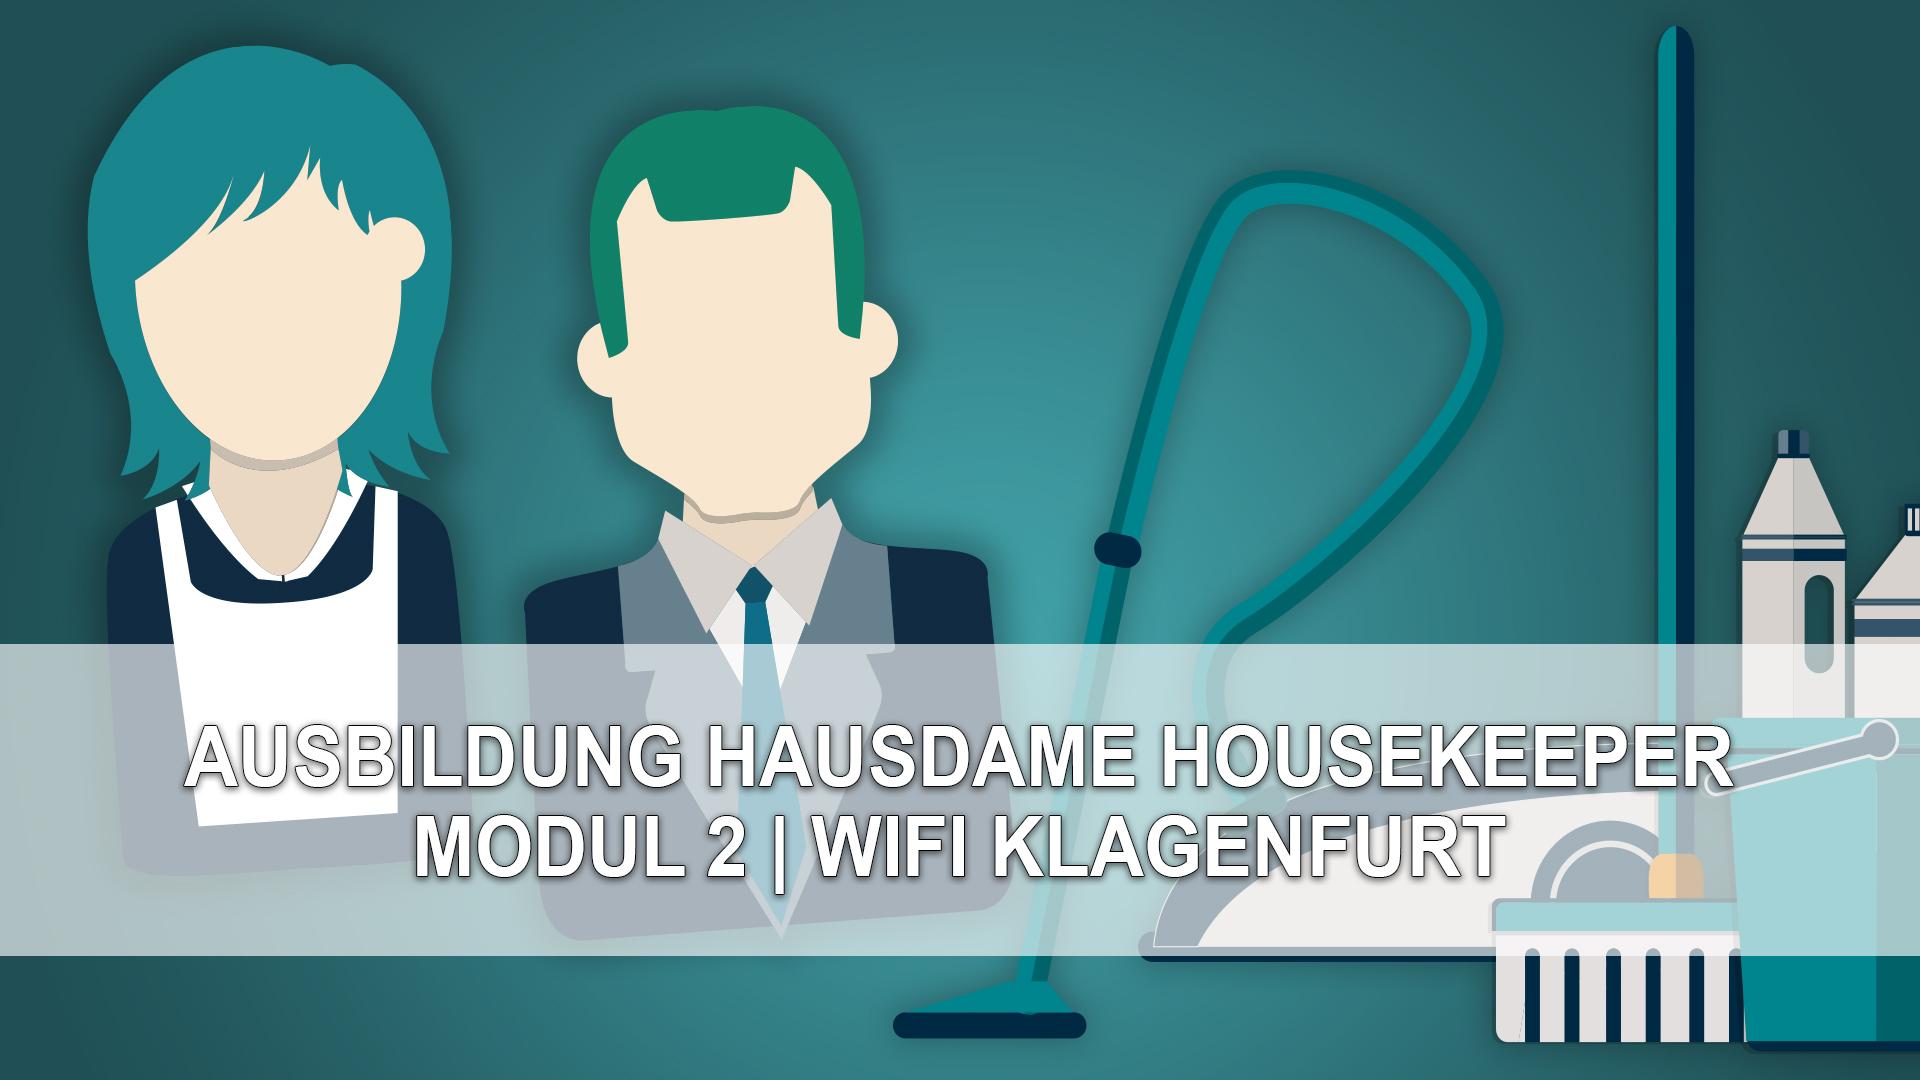 Ausbildung Hausdame Housekeeper Kärnten